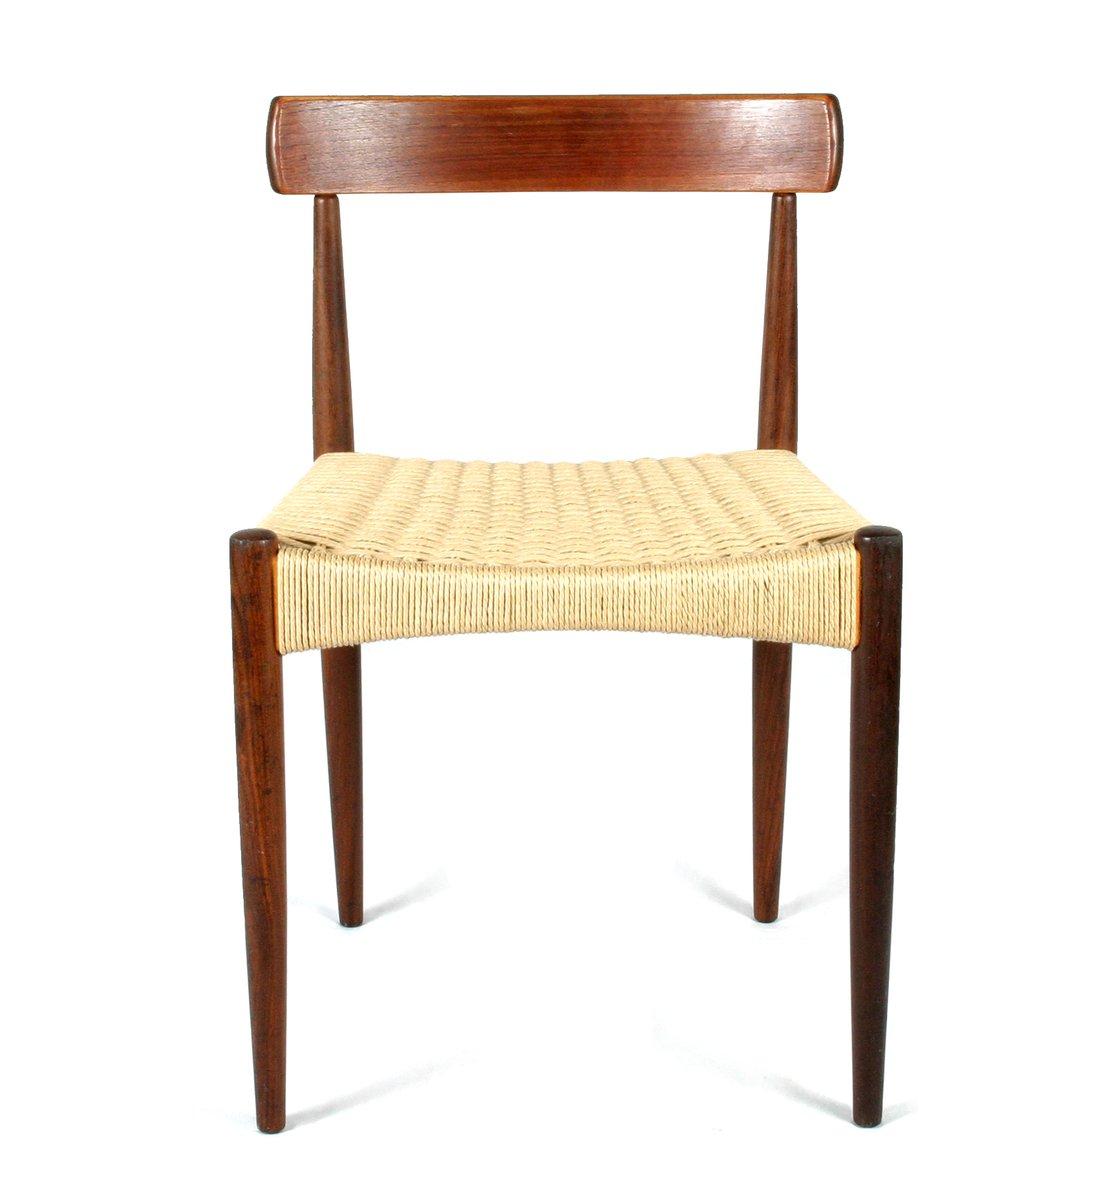 skandinavischer mid century stuhl von arne hovmand olsen f r mogens kold bei pamono kaufen. Black Bedroom Furniture Sets. Home Design Ideas